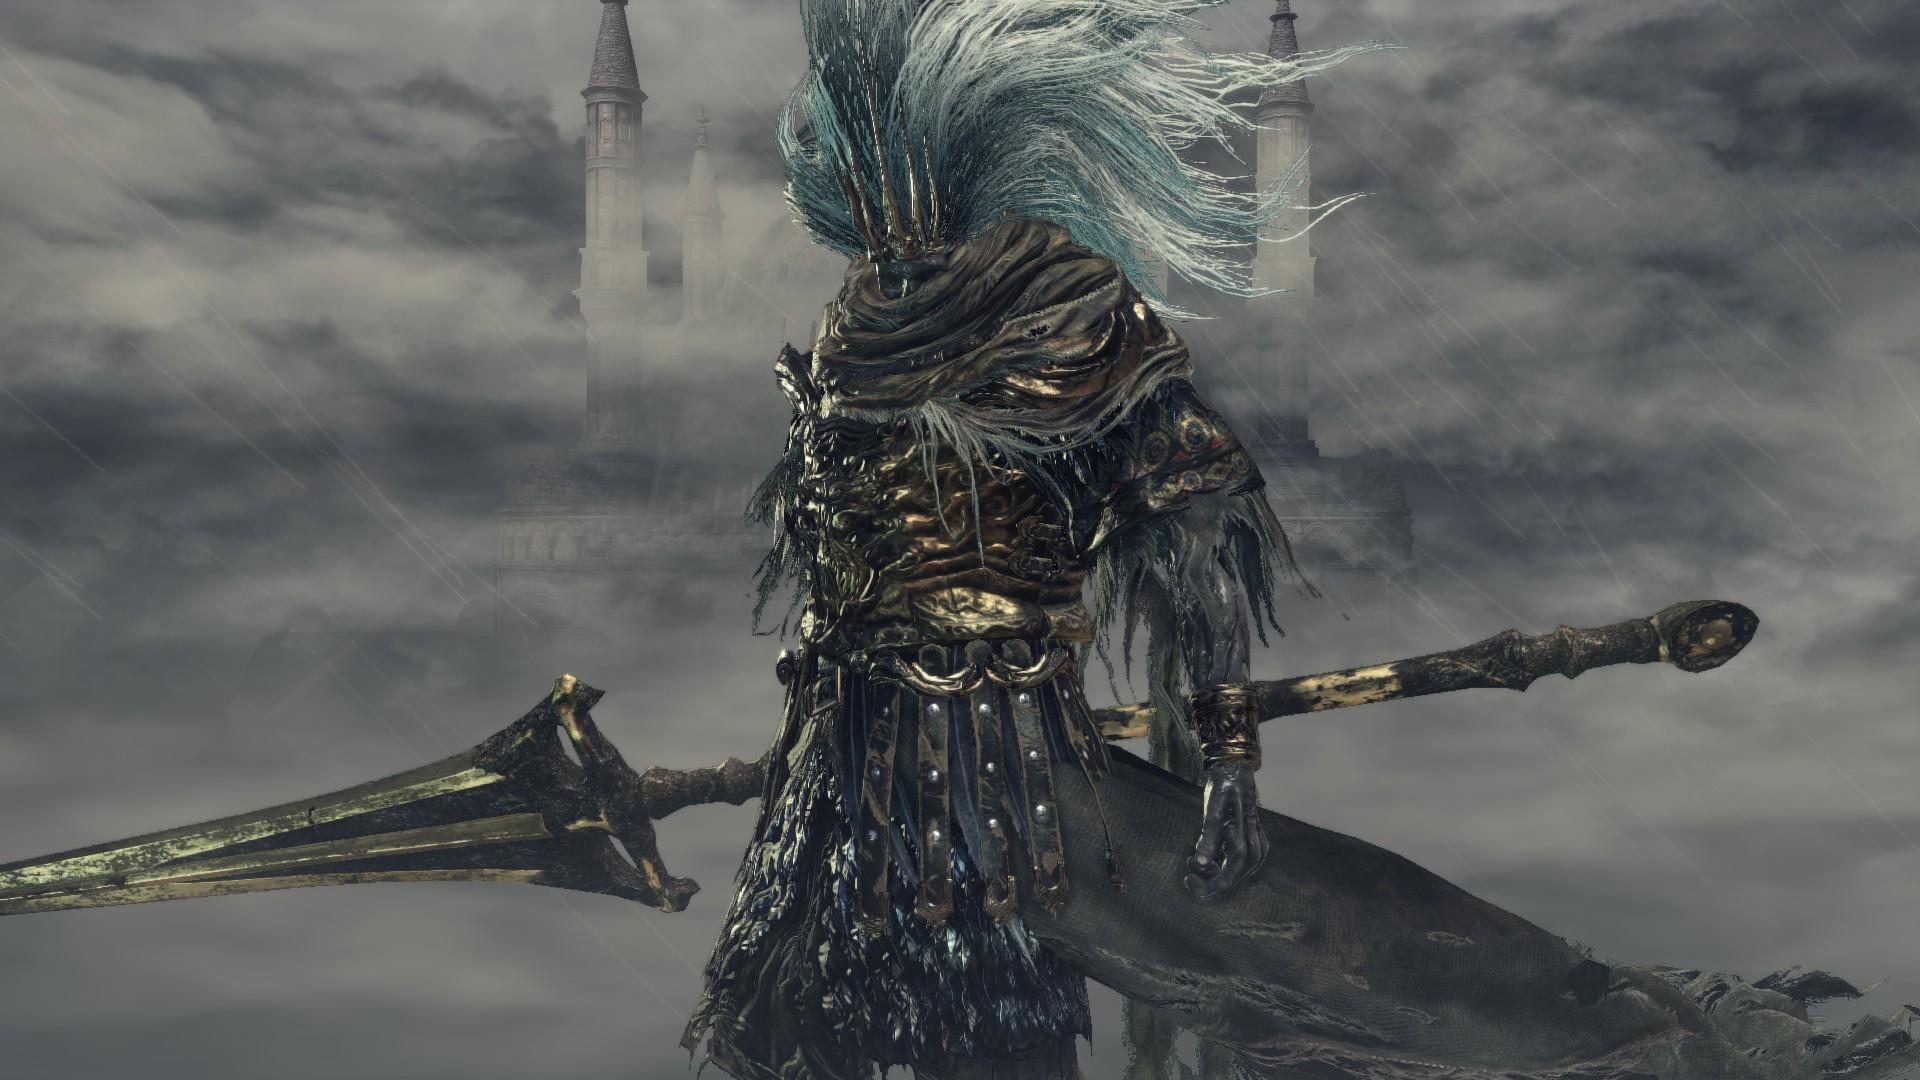 Gamasutra josh 39 s blog debating difficulty settings i for Dark souls 3 architecture